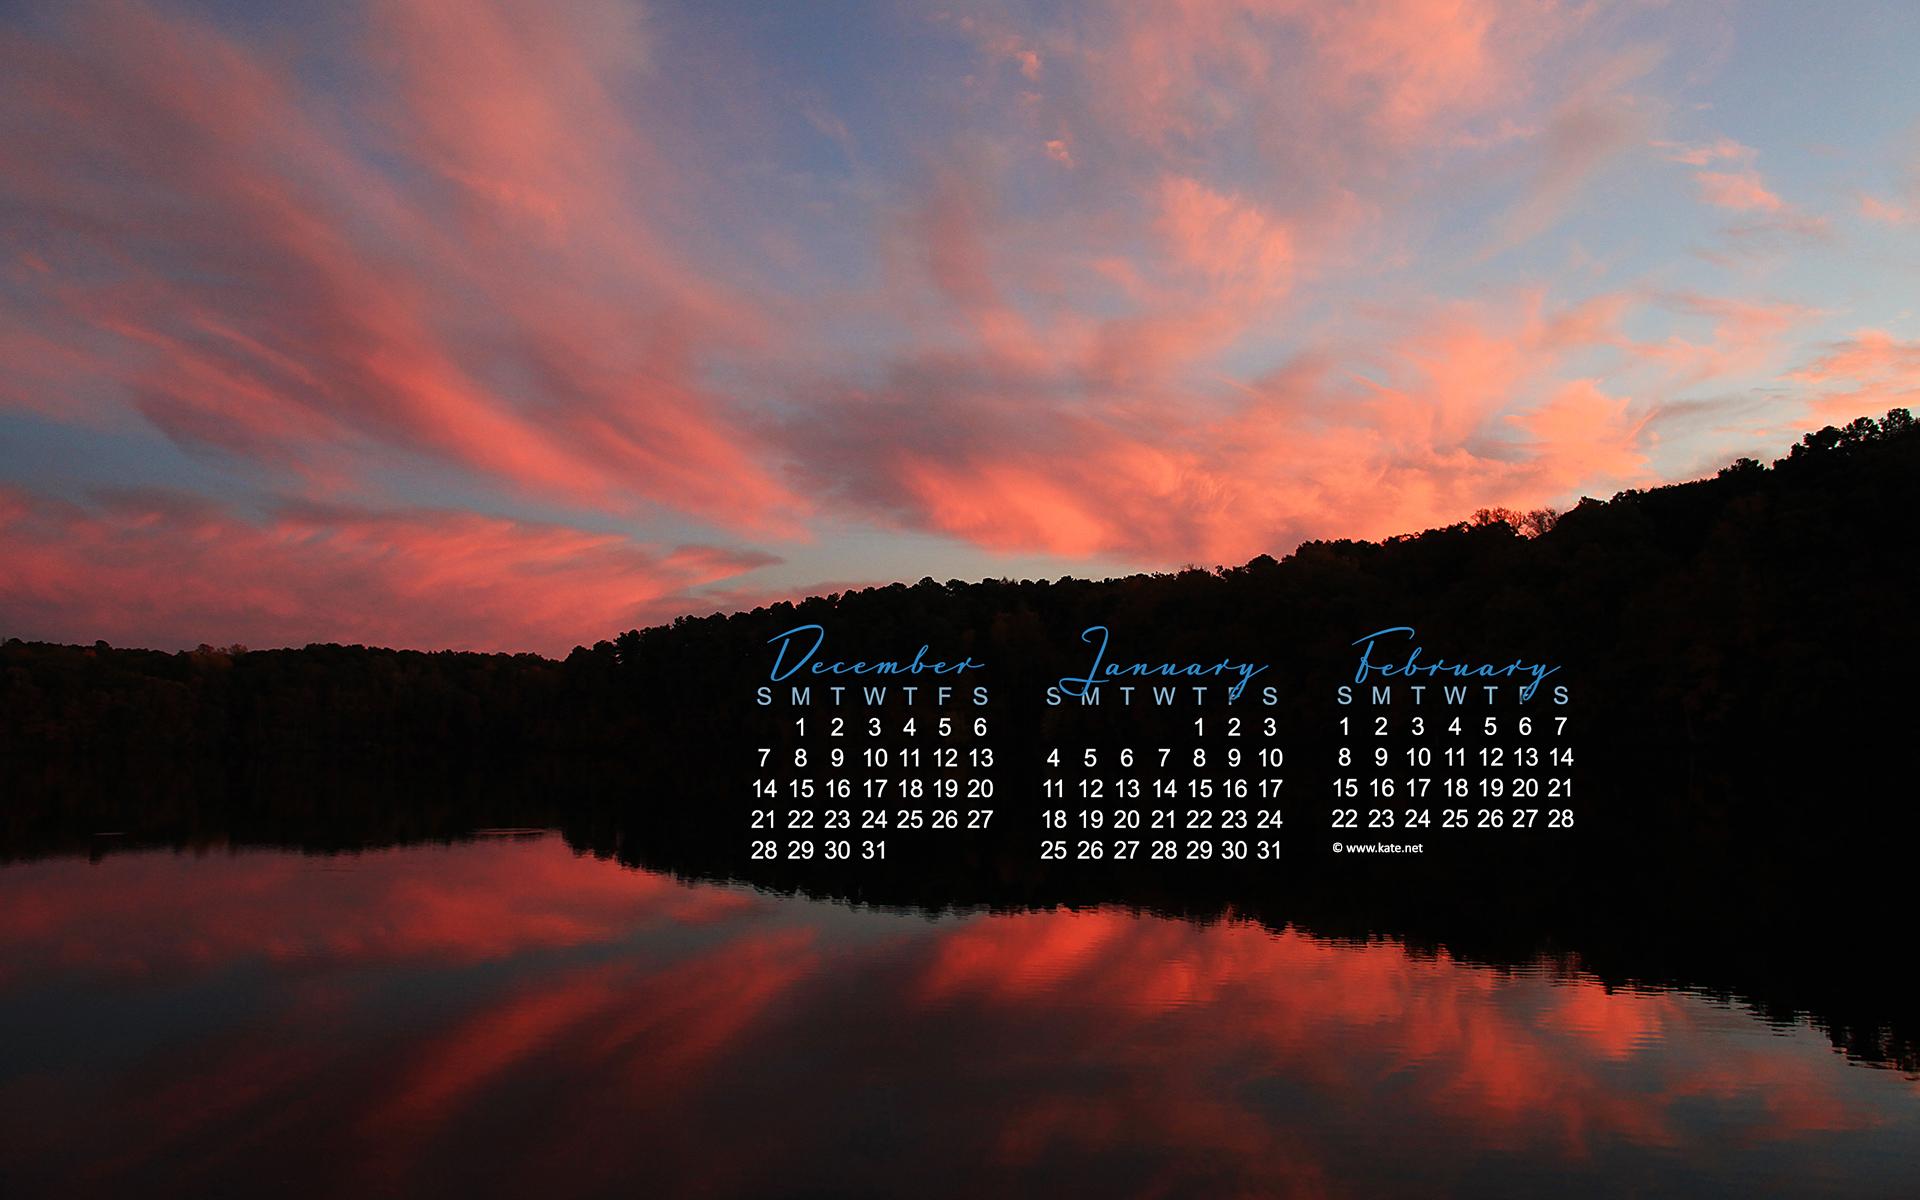 January 2015 Calendar Wallpaper 1920x1200